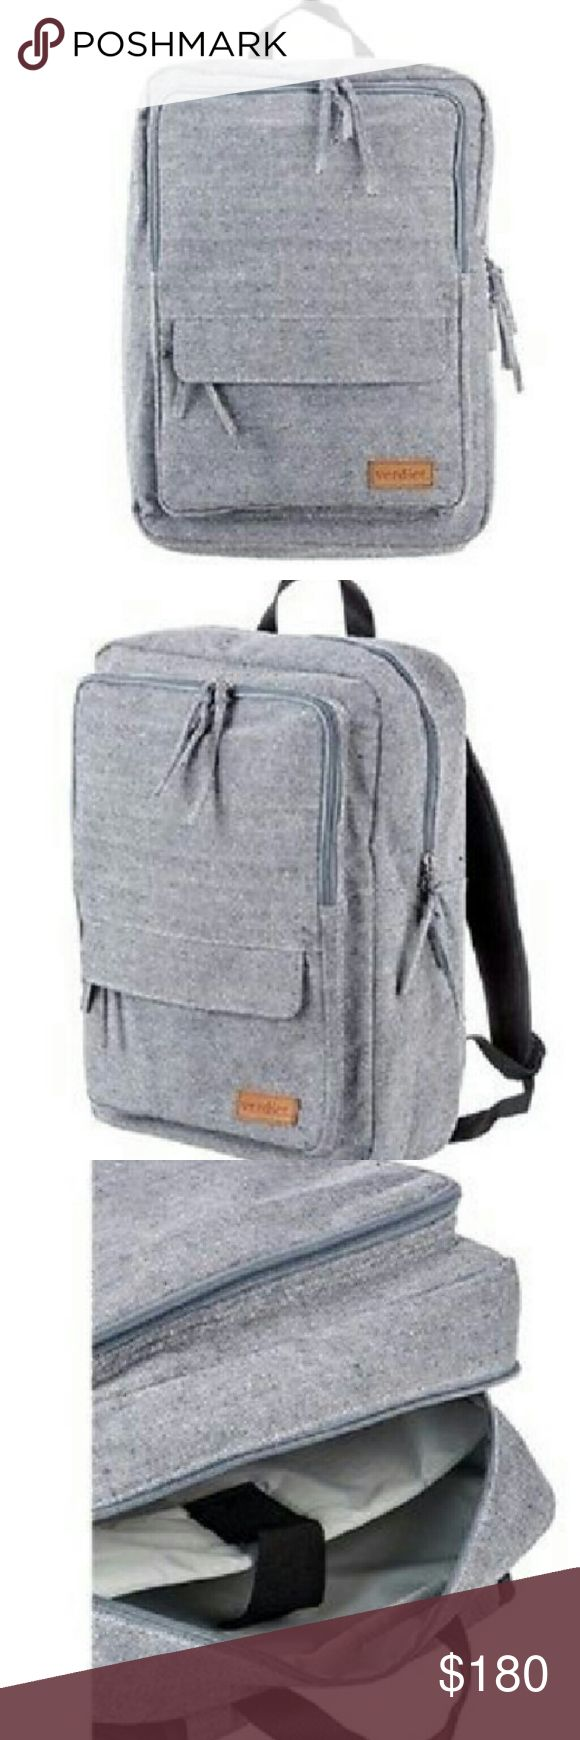 Verdict original backpack  nwt,unisex Laptop backpack, storage, school back pack , verdict original  Bags Backpacks